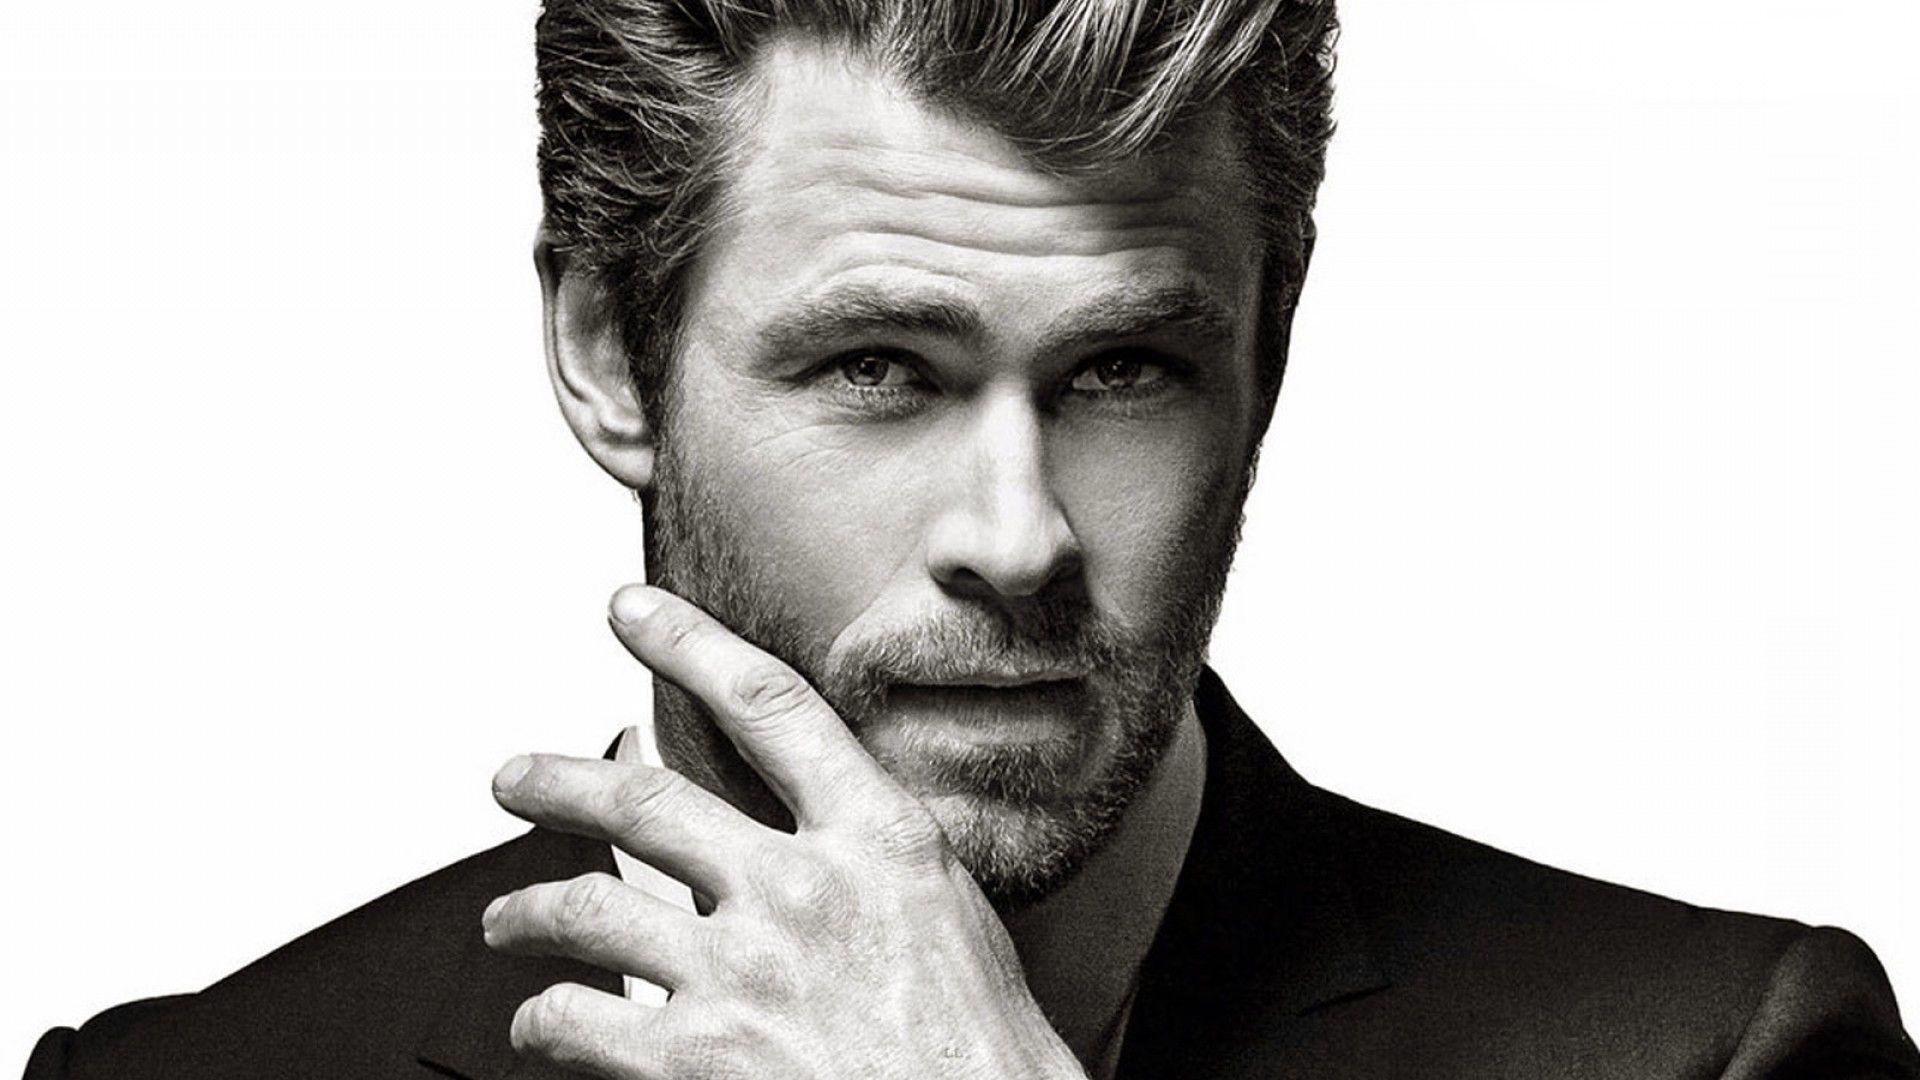 Chris Hemsworth Wallpapers 1920x1080